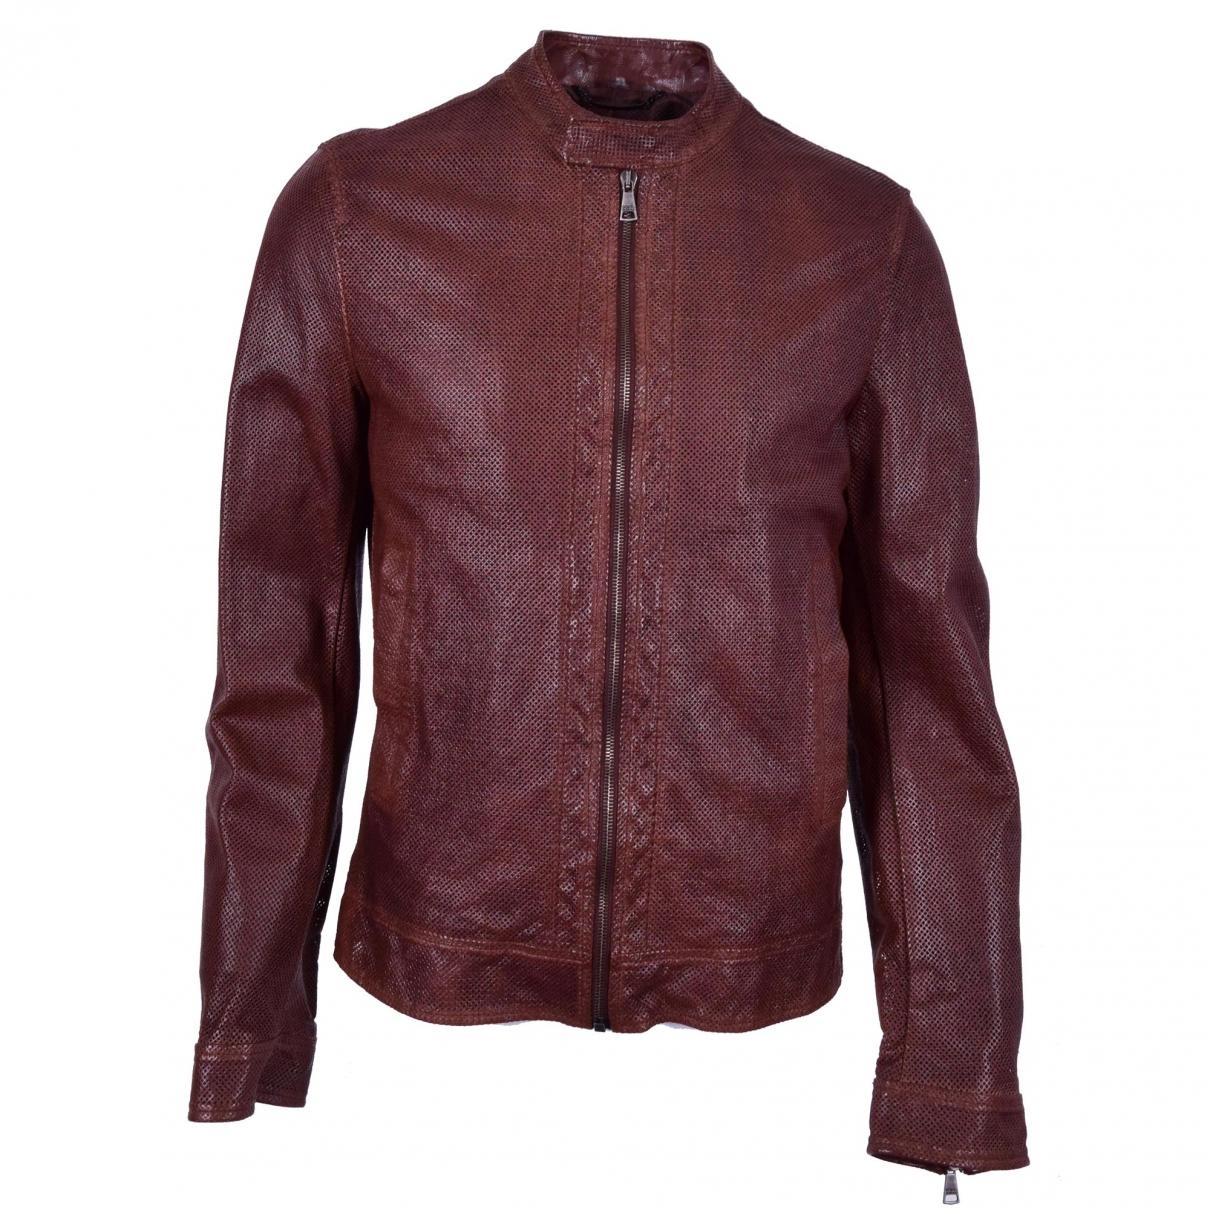 Dolce & Gabbana \N Burgundy Leather jacket  for Men 48 IT